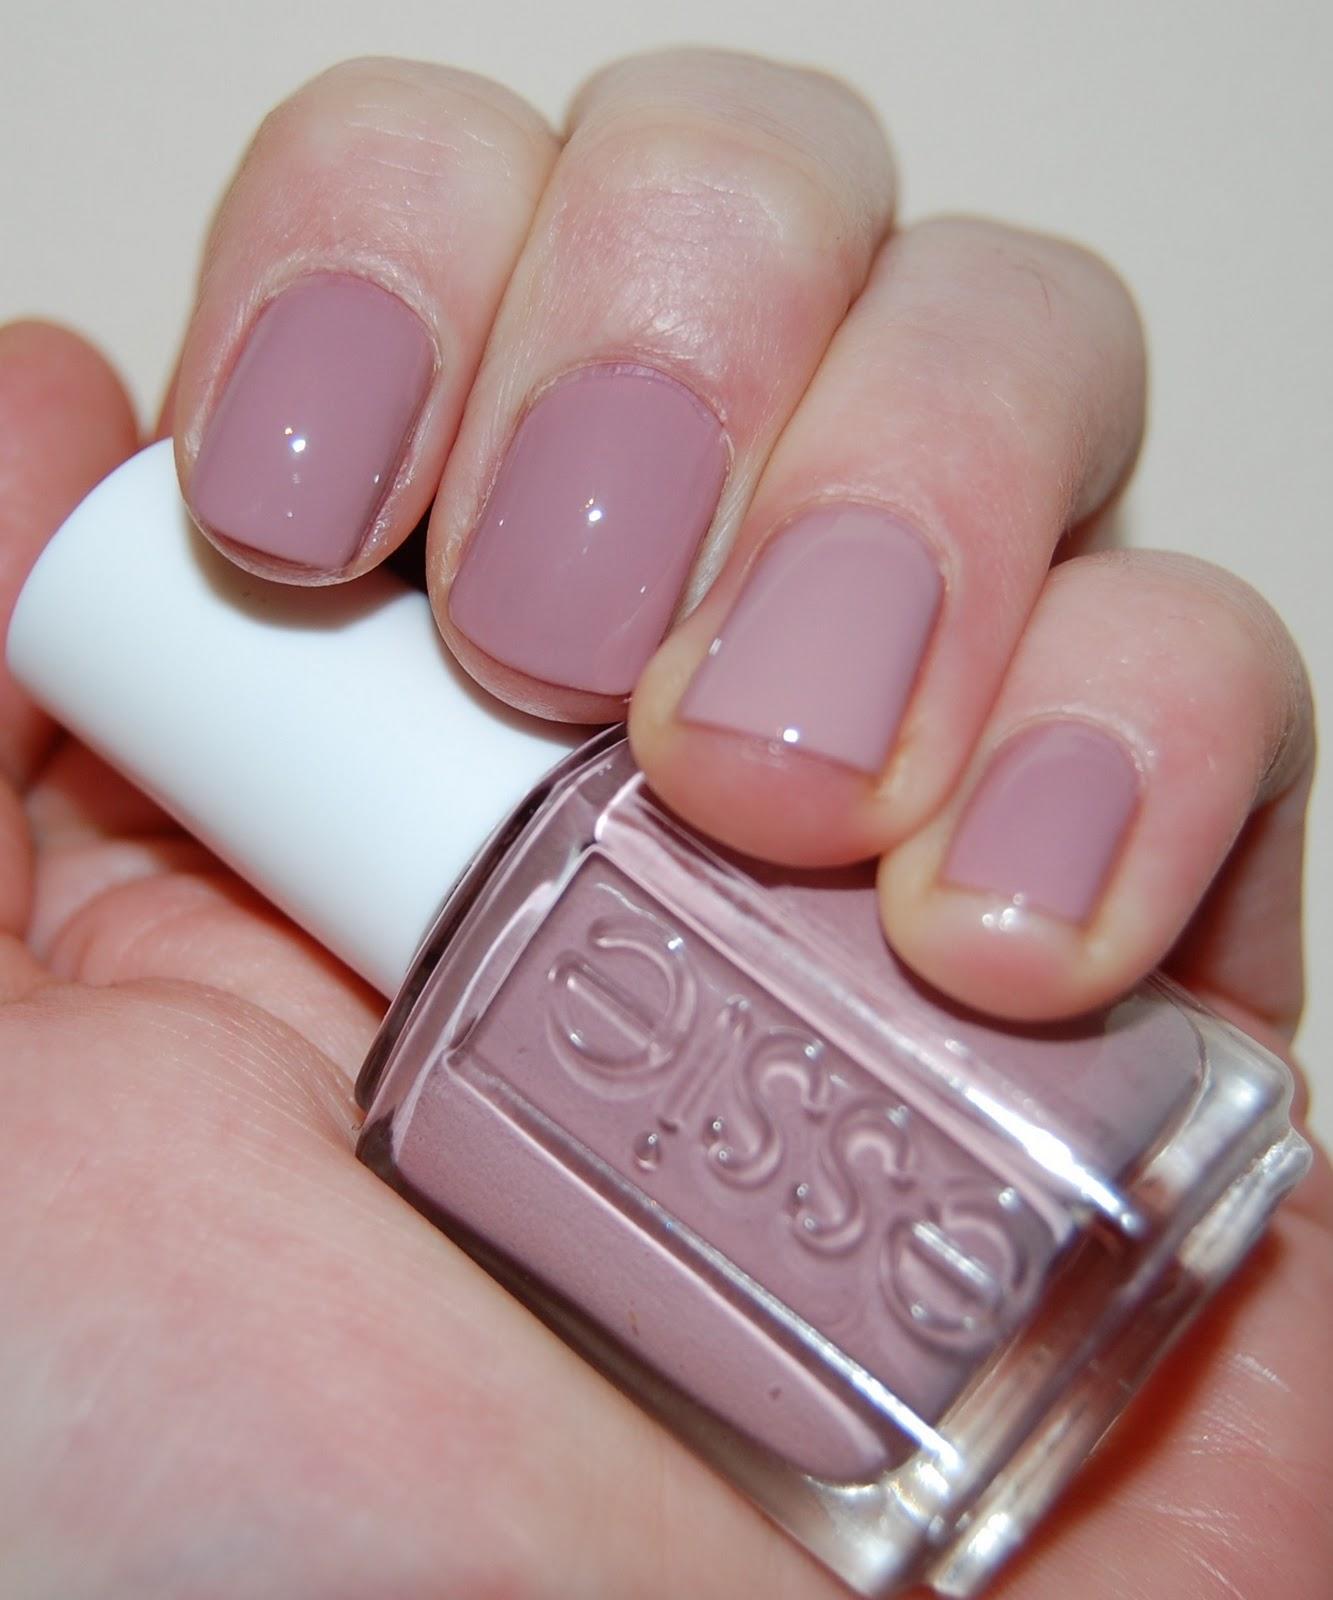 Lipstick Fridays - Beauty Blog: Nail of the day